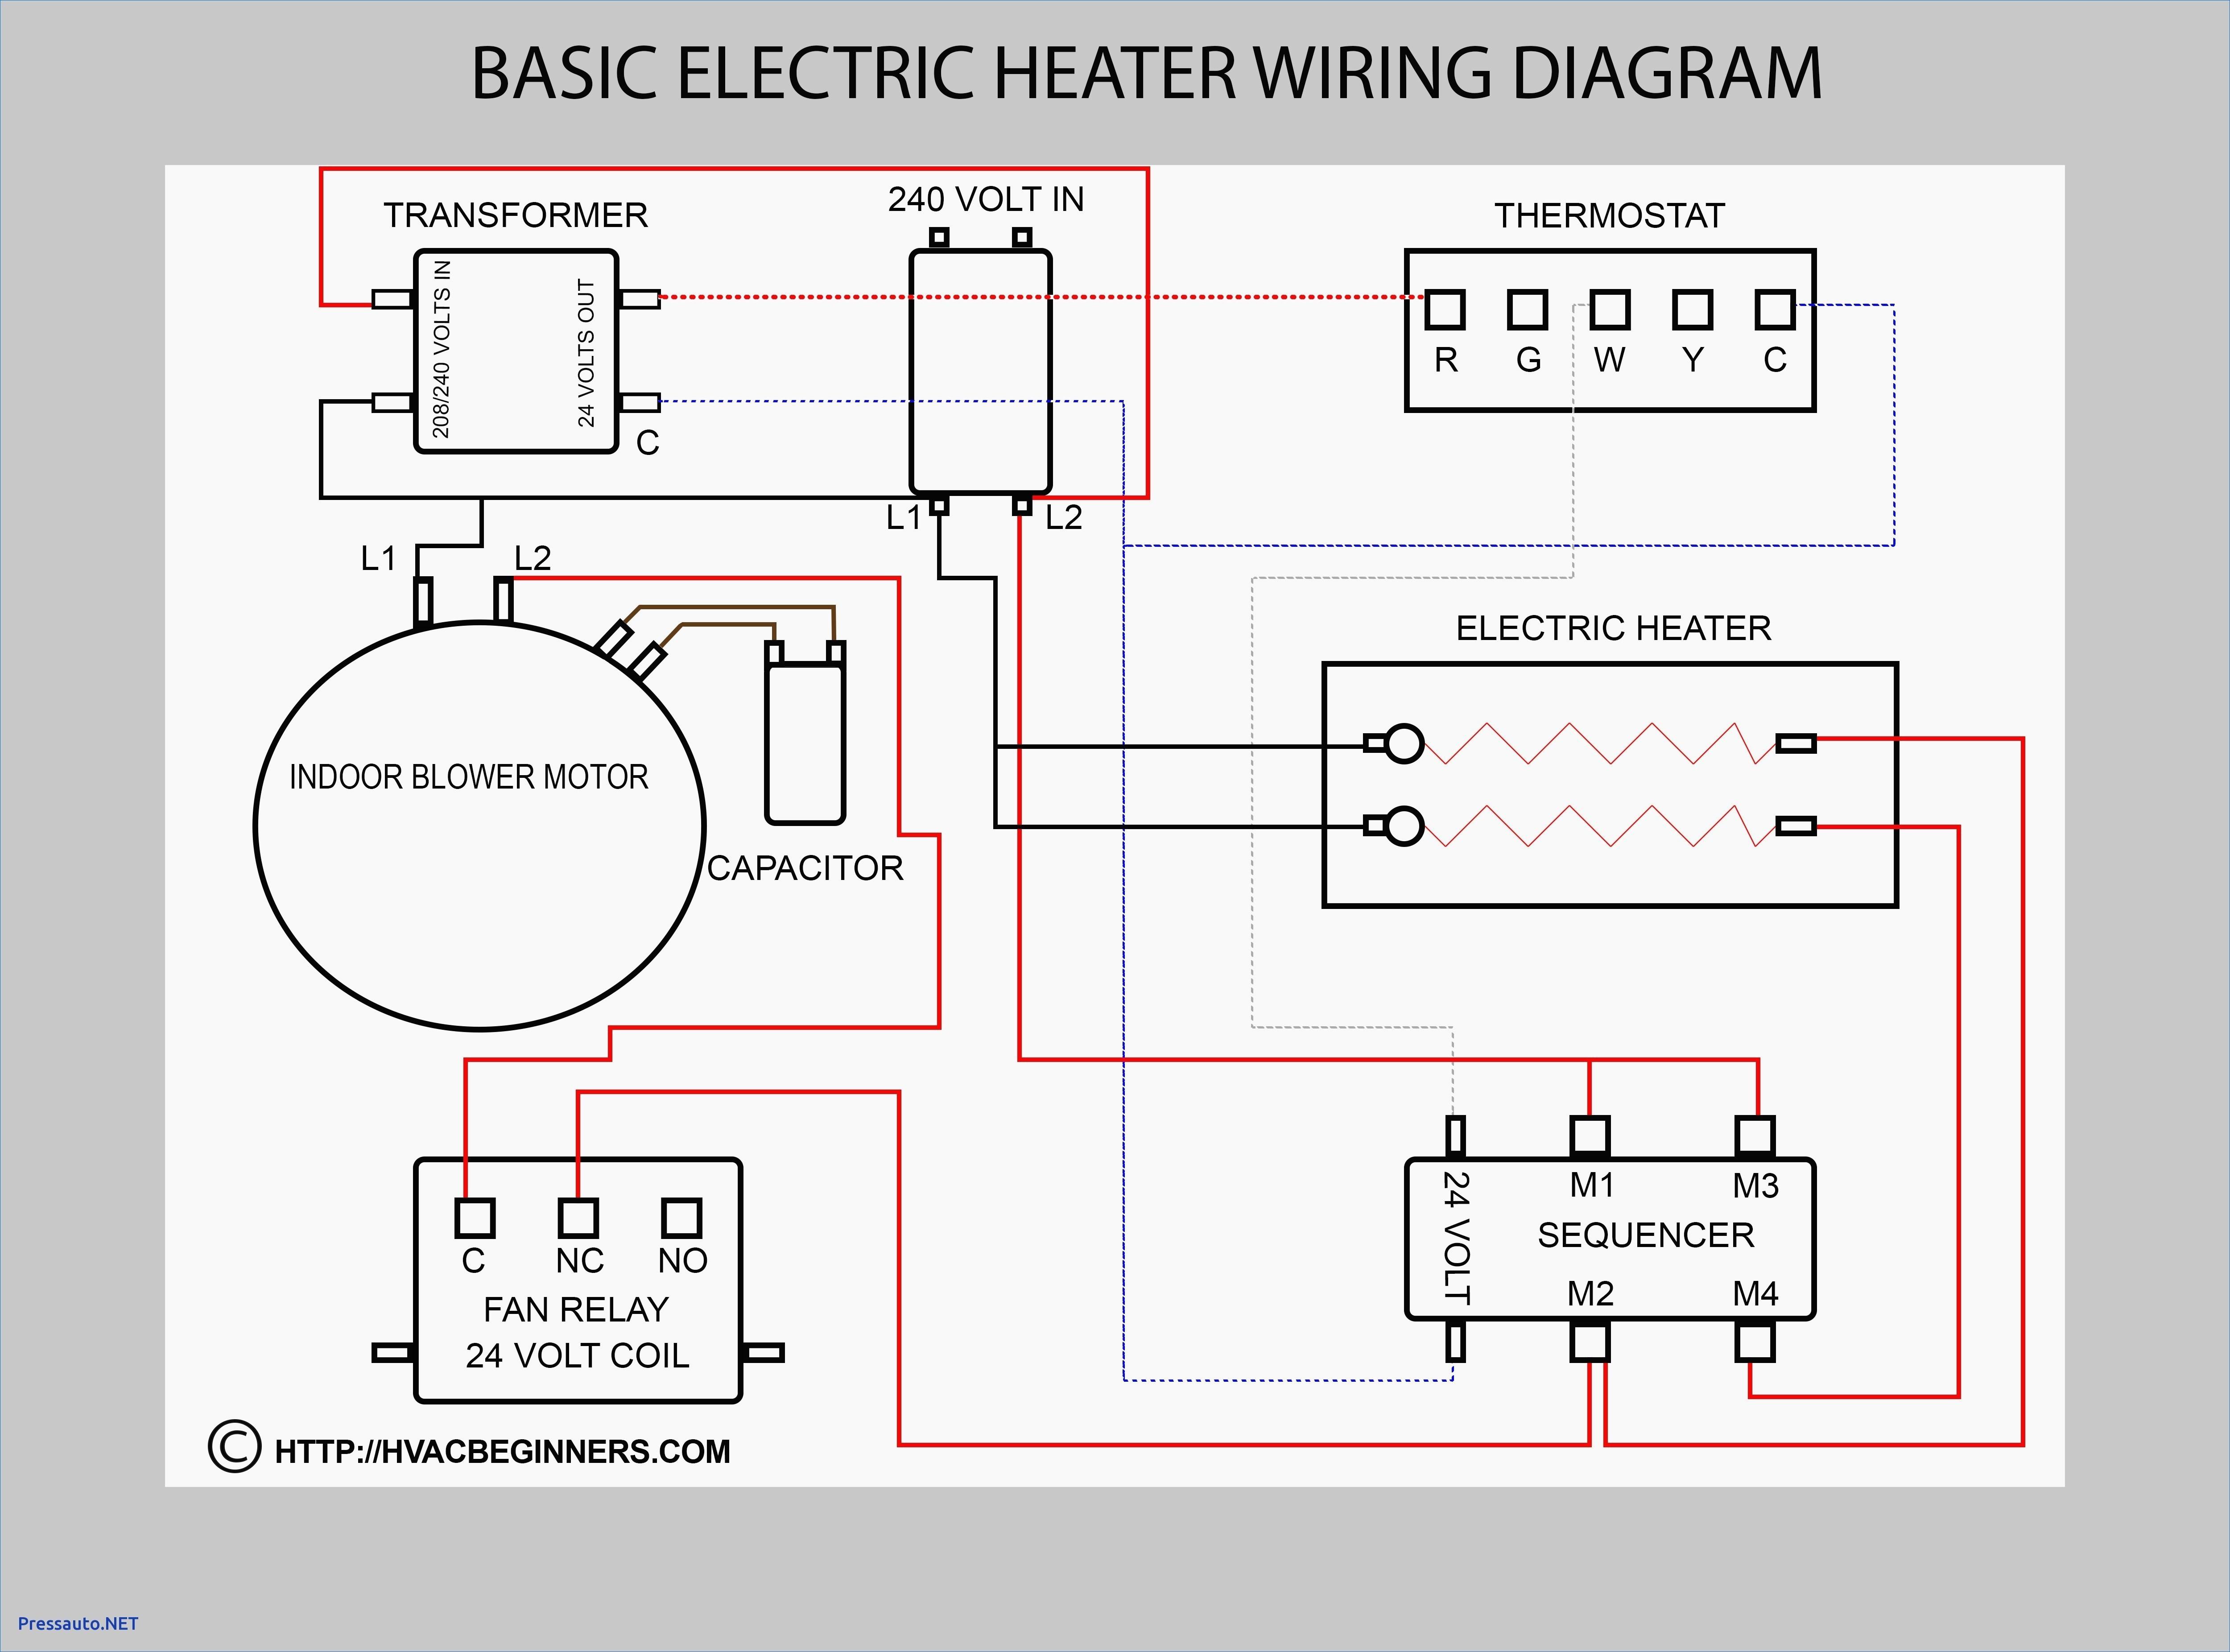 Heat Pump Wiring Diagrams Elegant Heat Pump thermostat Wiring Diagram Diagram Of Heat Pump Wiring Diagrams